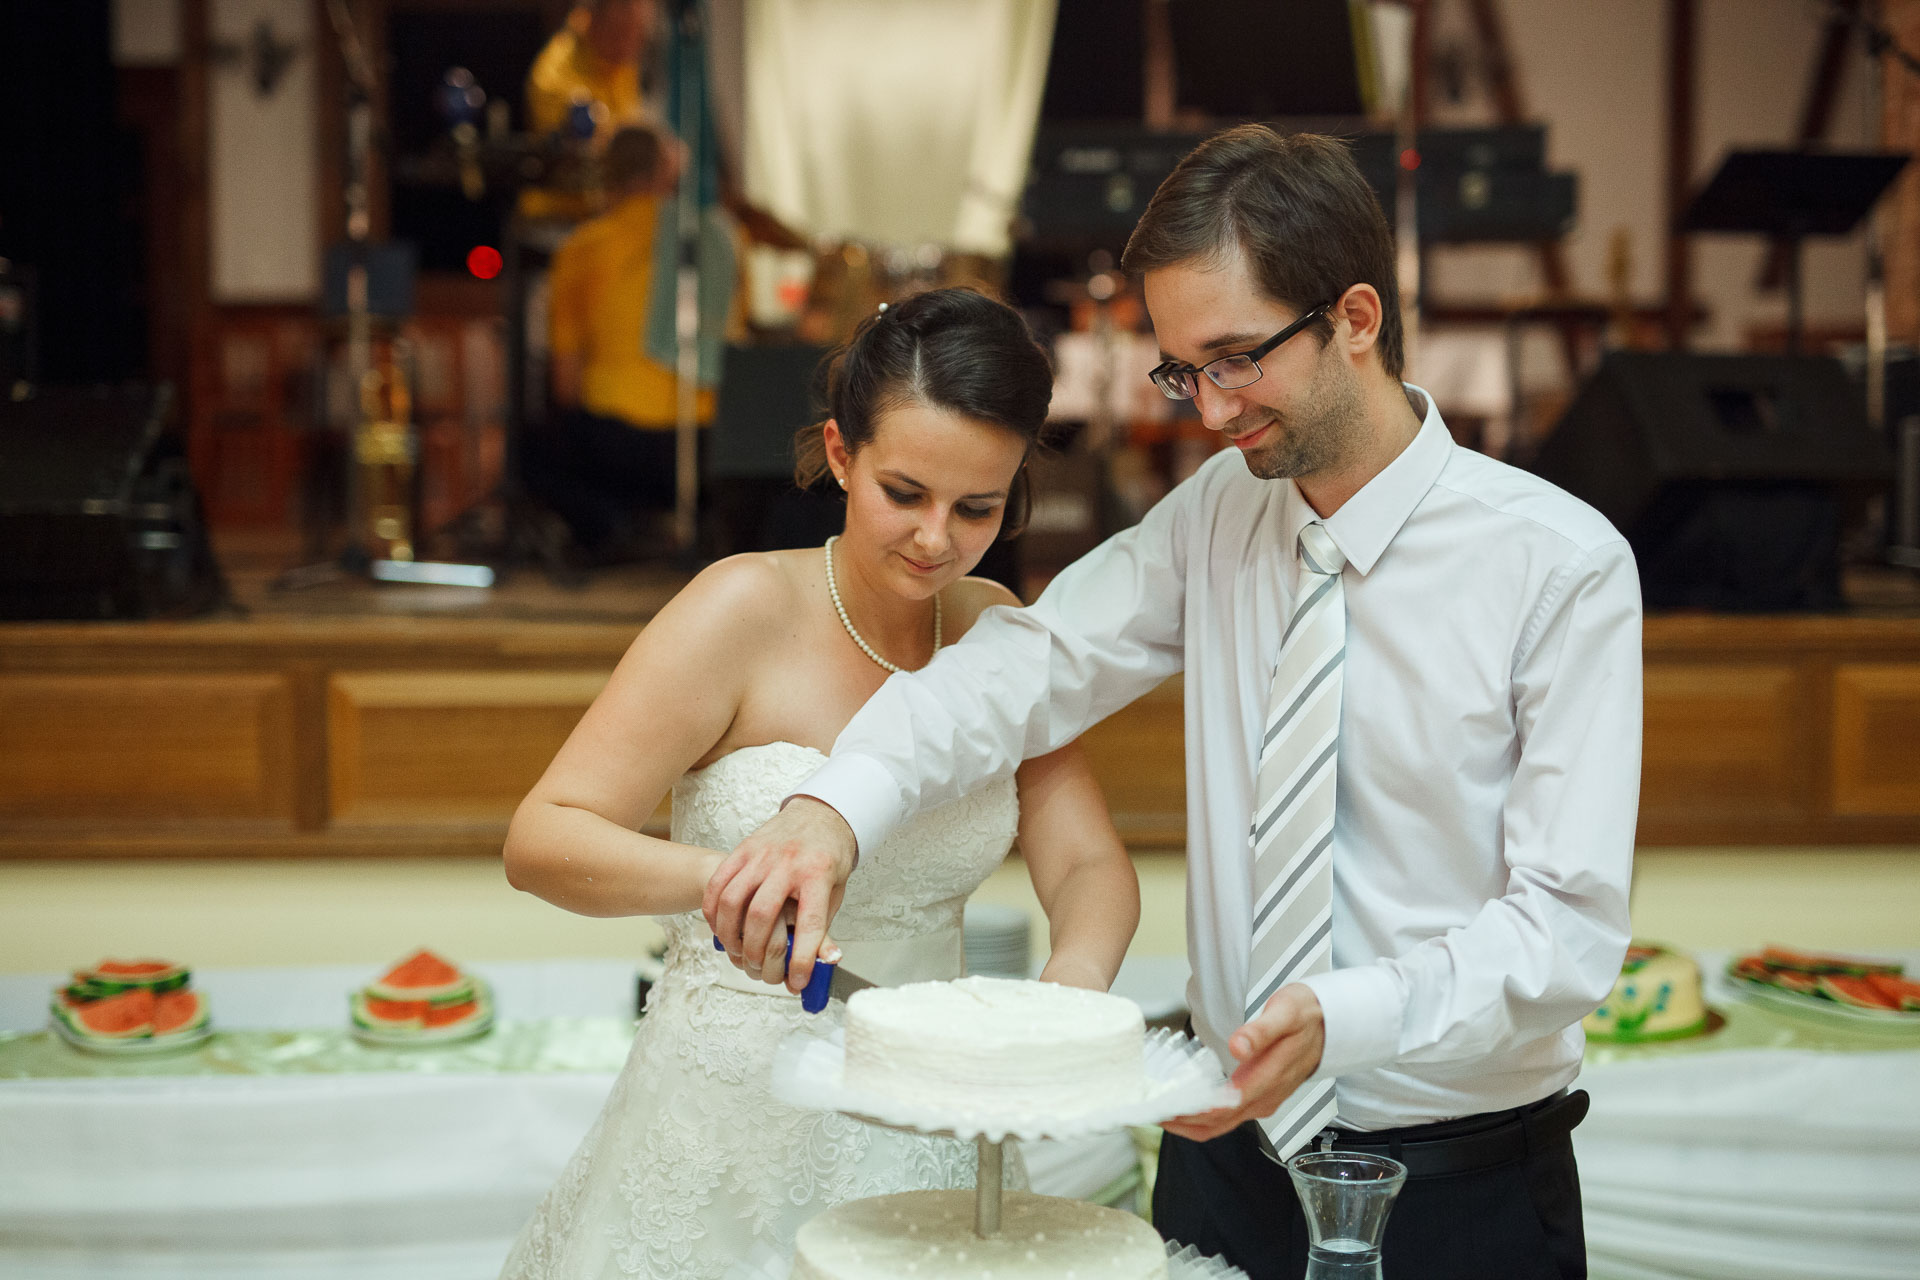 eskuvo_fotozas_wedding_foto_lenart_gabor_sztyui_budapest_0727_IMG_1873